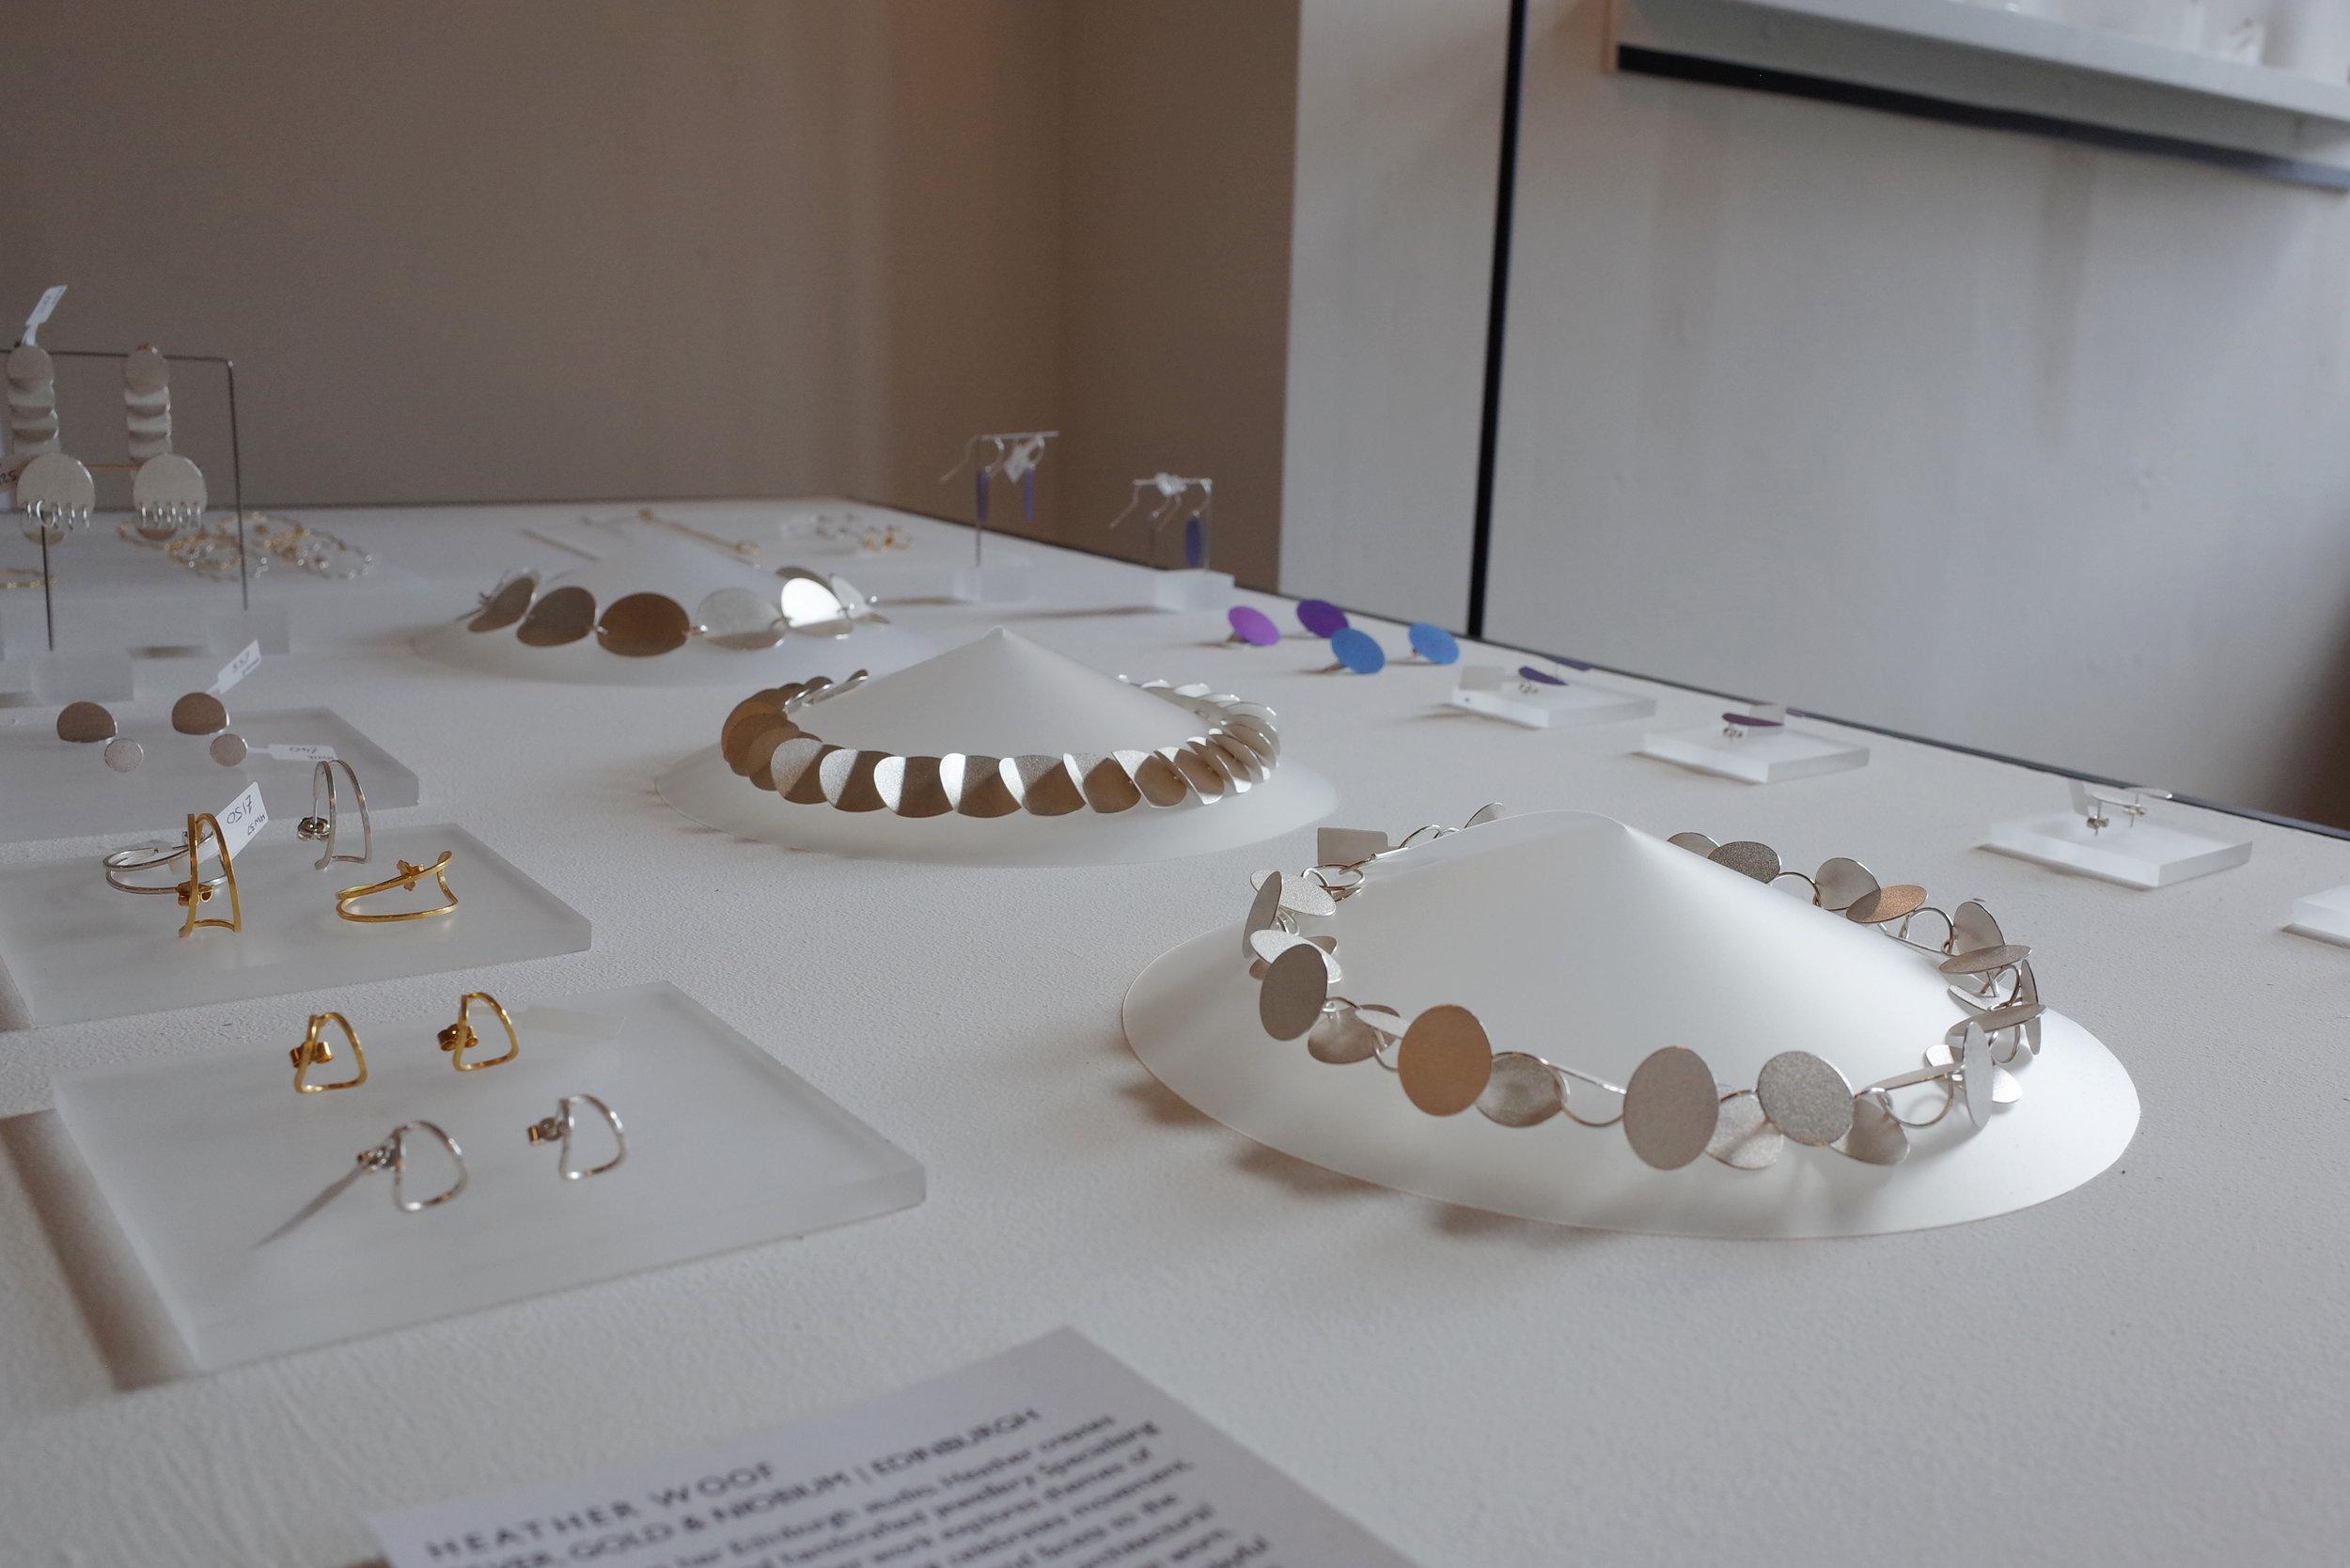 Heather Woof Jewellery at Craft Scotland Summer show